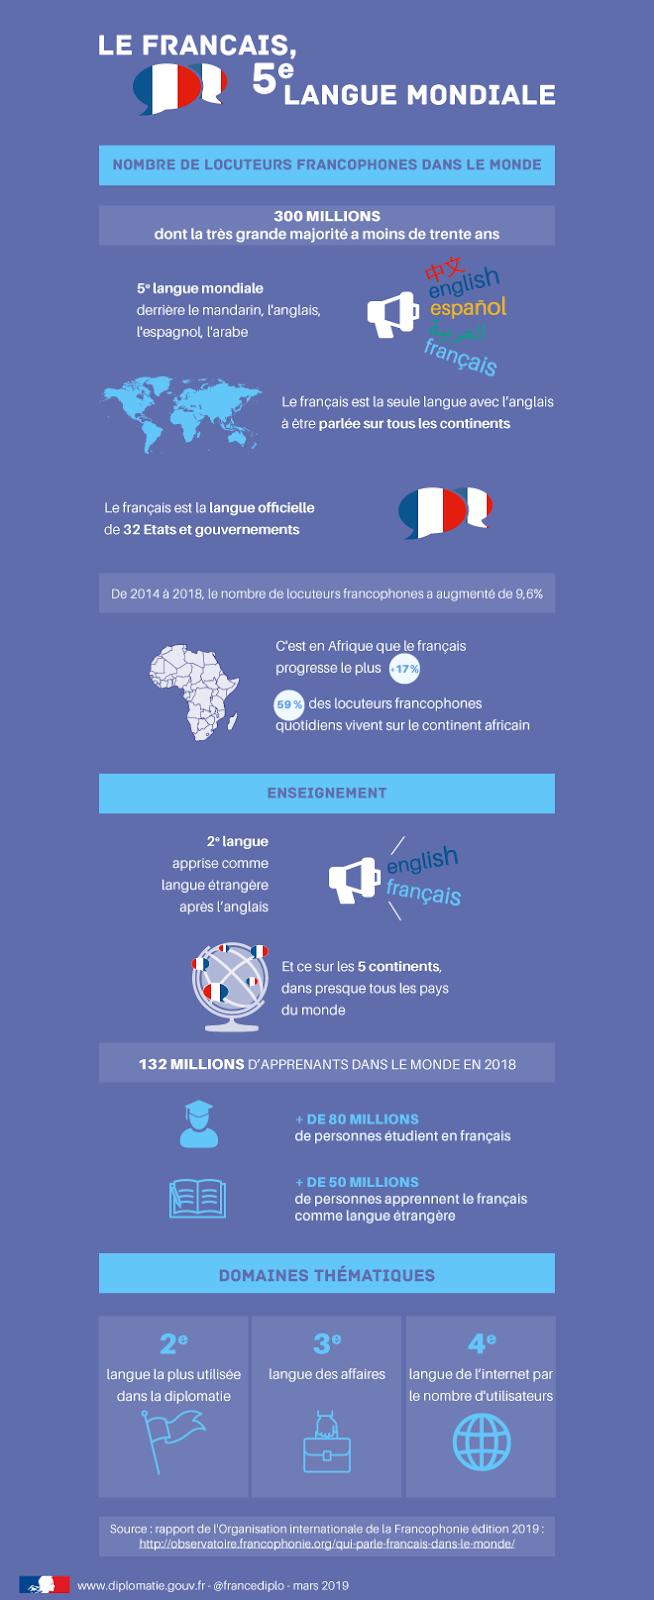 https://www.diplomatie.gouv.fr/IMG/png/francophonie_maj_2019-fr_cle8a62e1.png